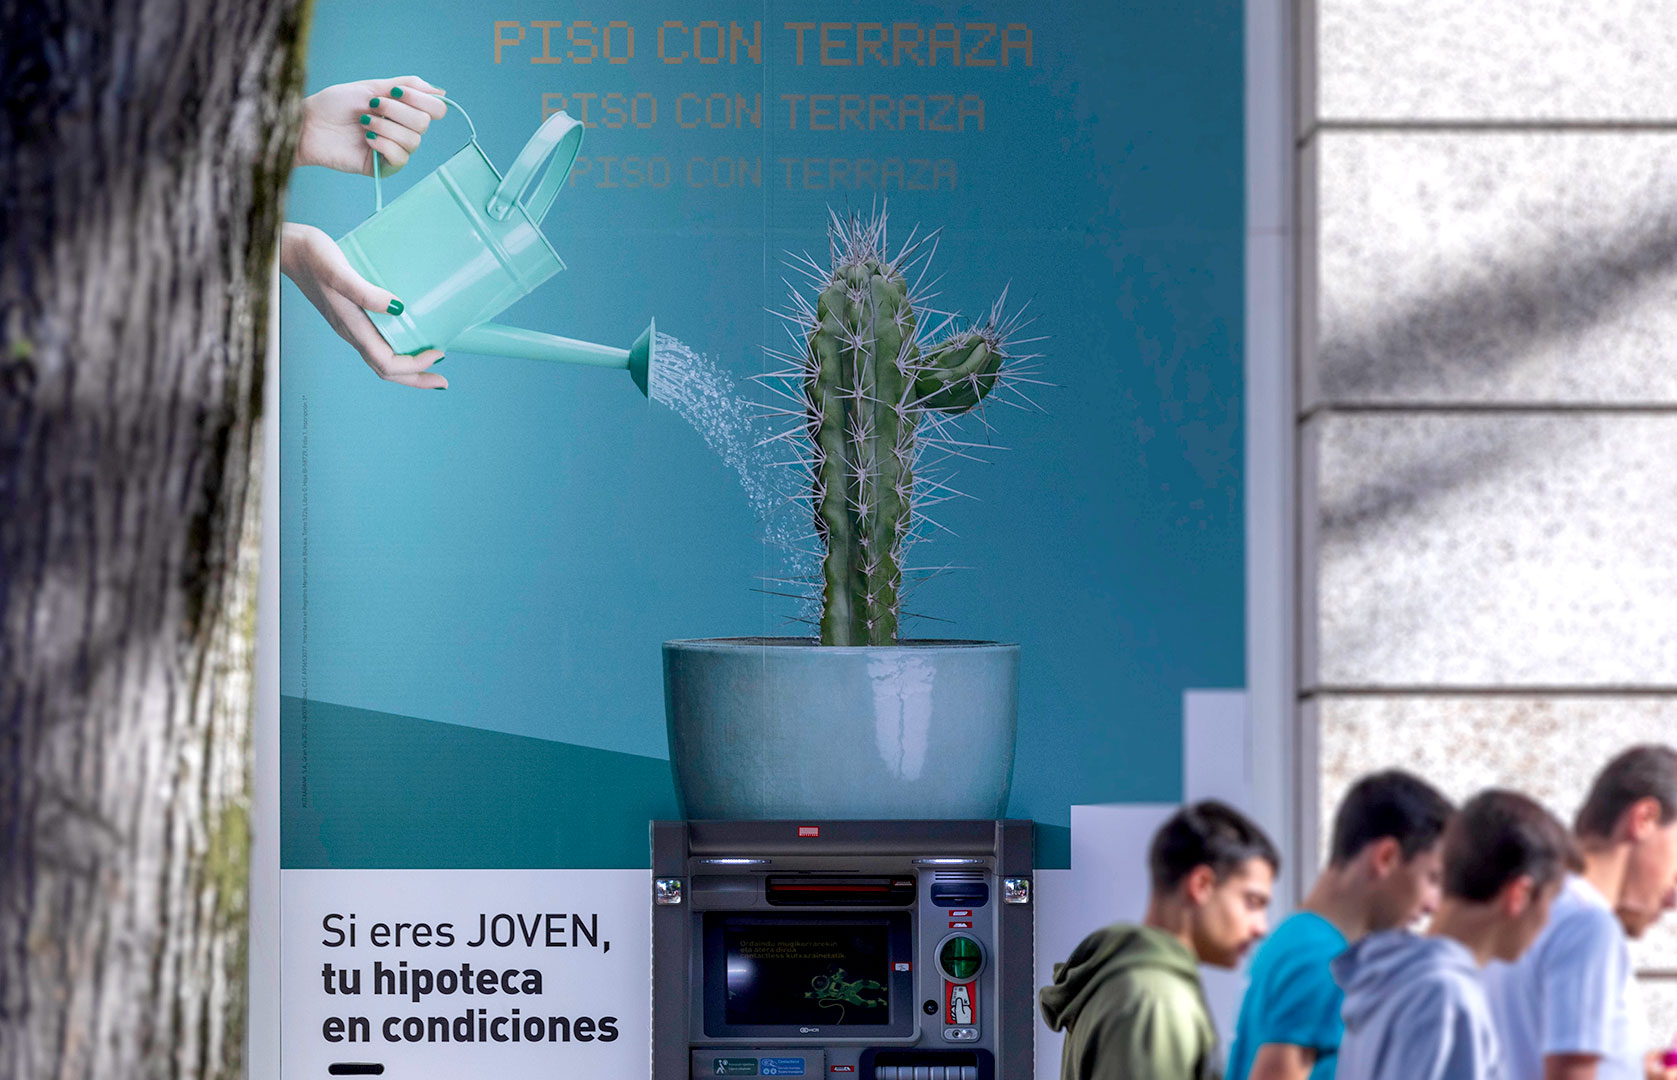 kutxabank korner foto cajero automático Bilbao